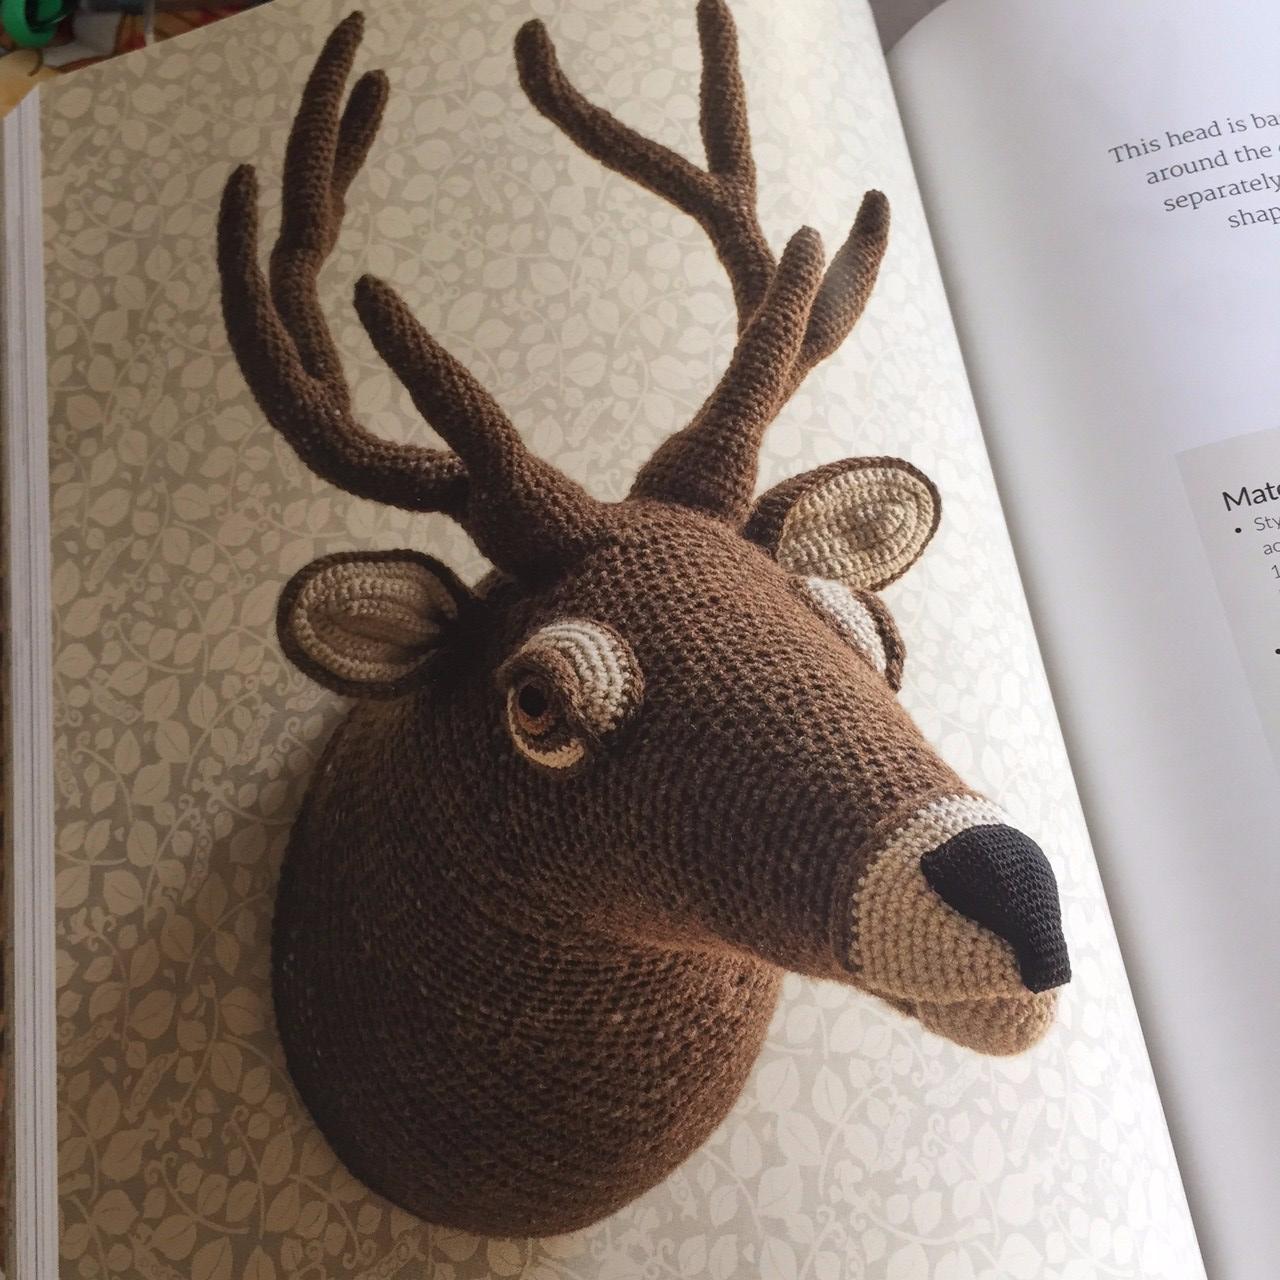 Crochet animal trophies by Vanessa Mooncie